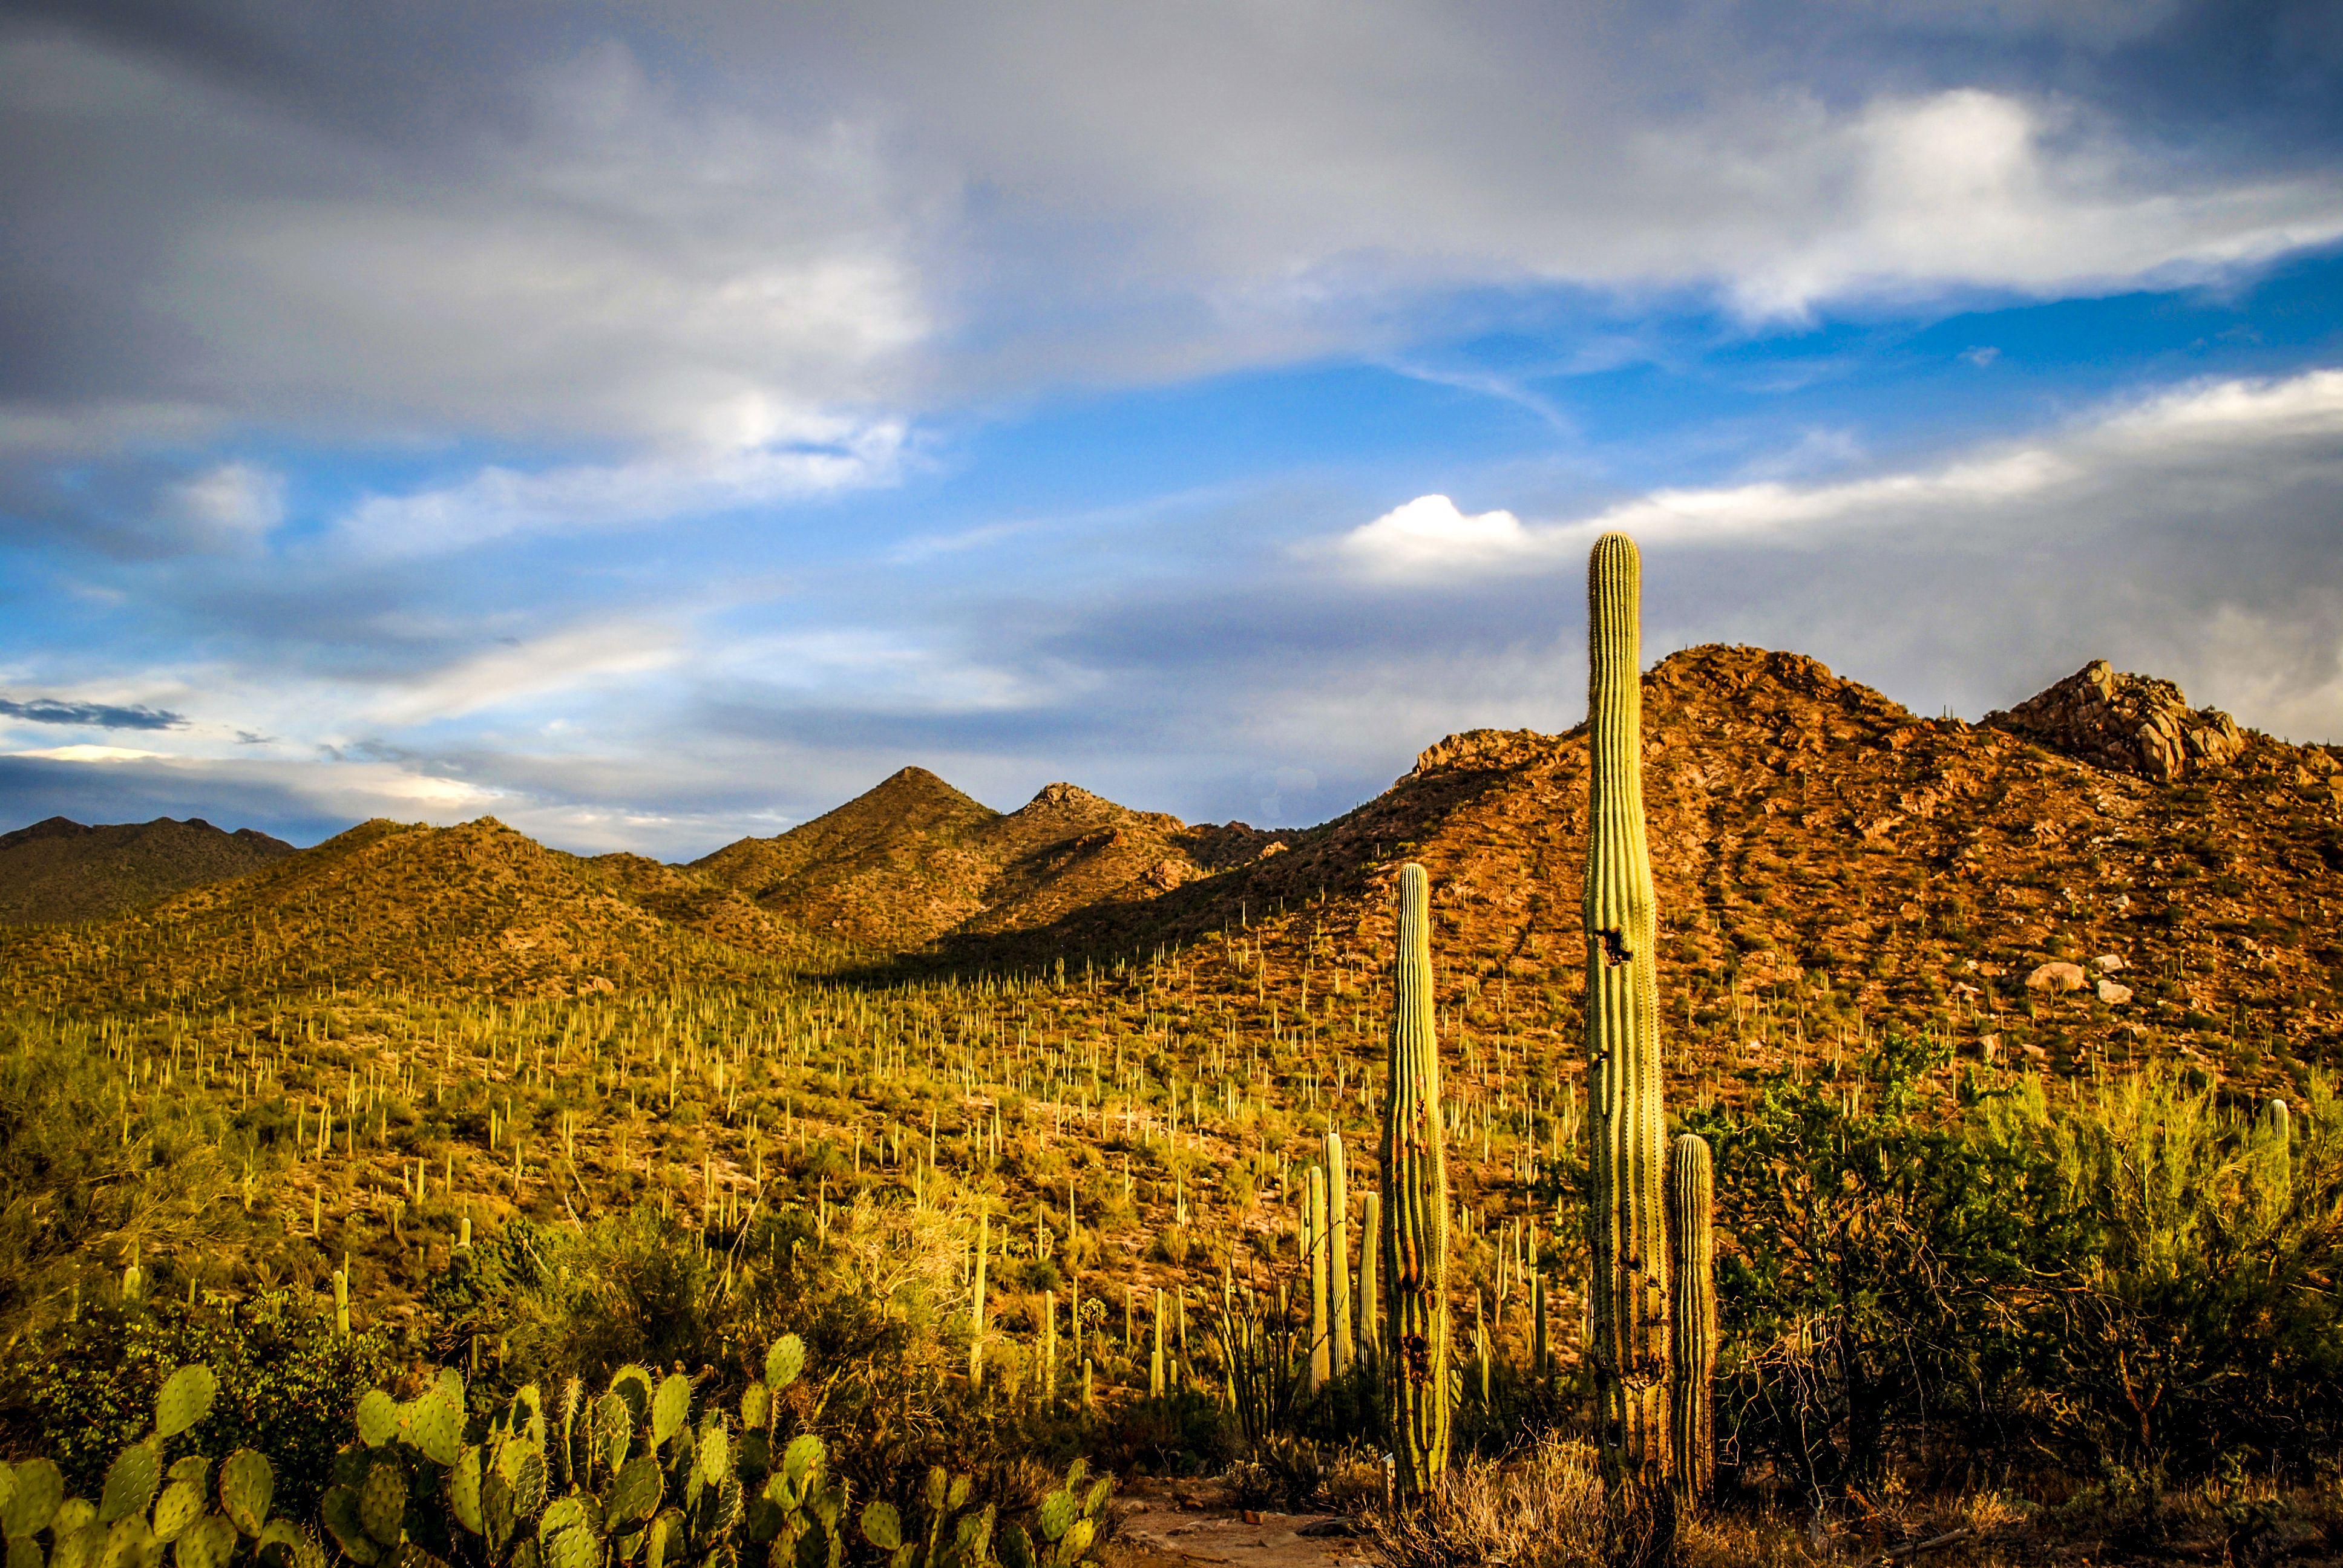 Free Activities To Do In Tucson Arizona